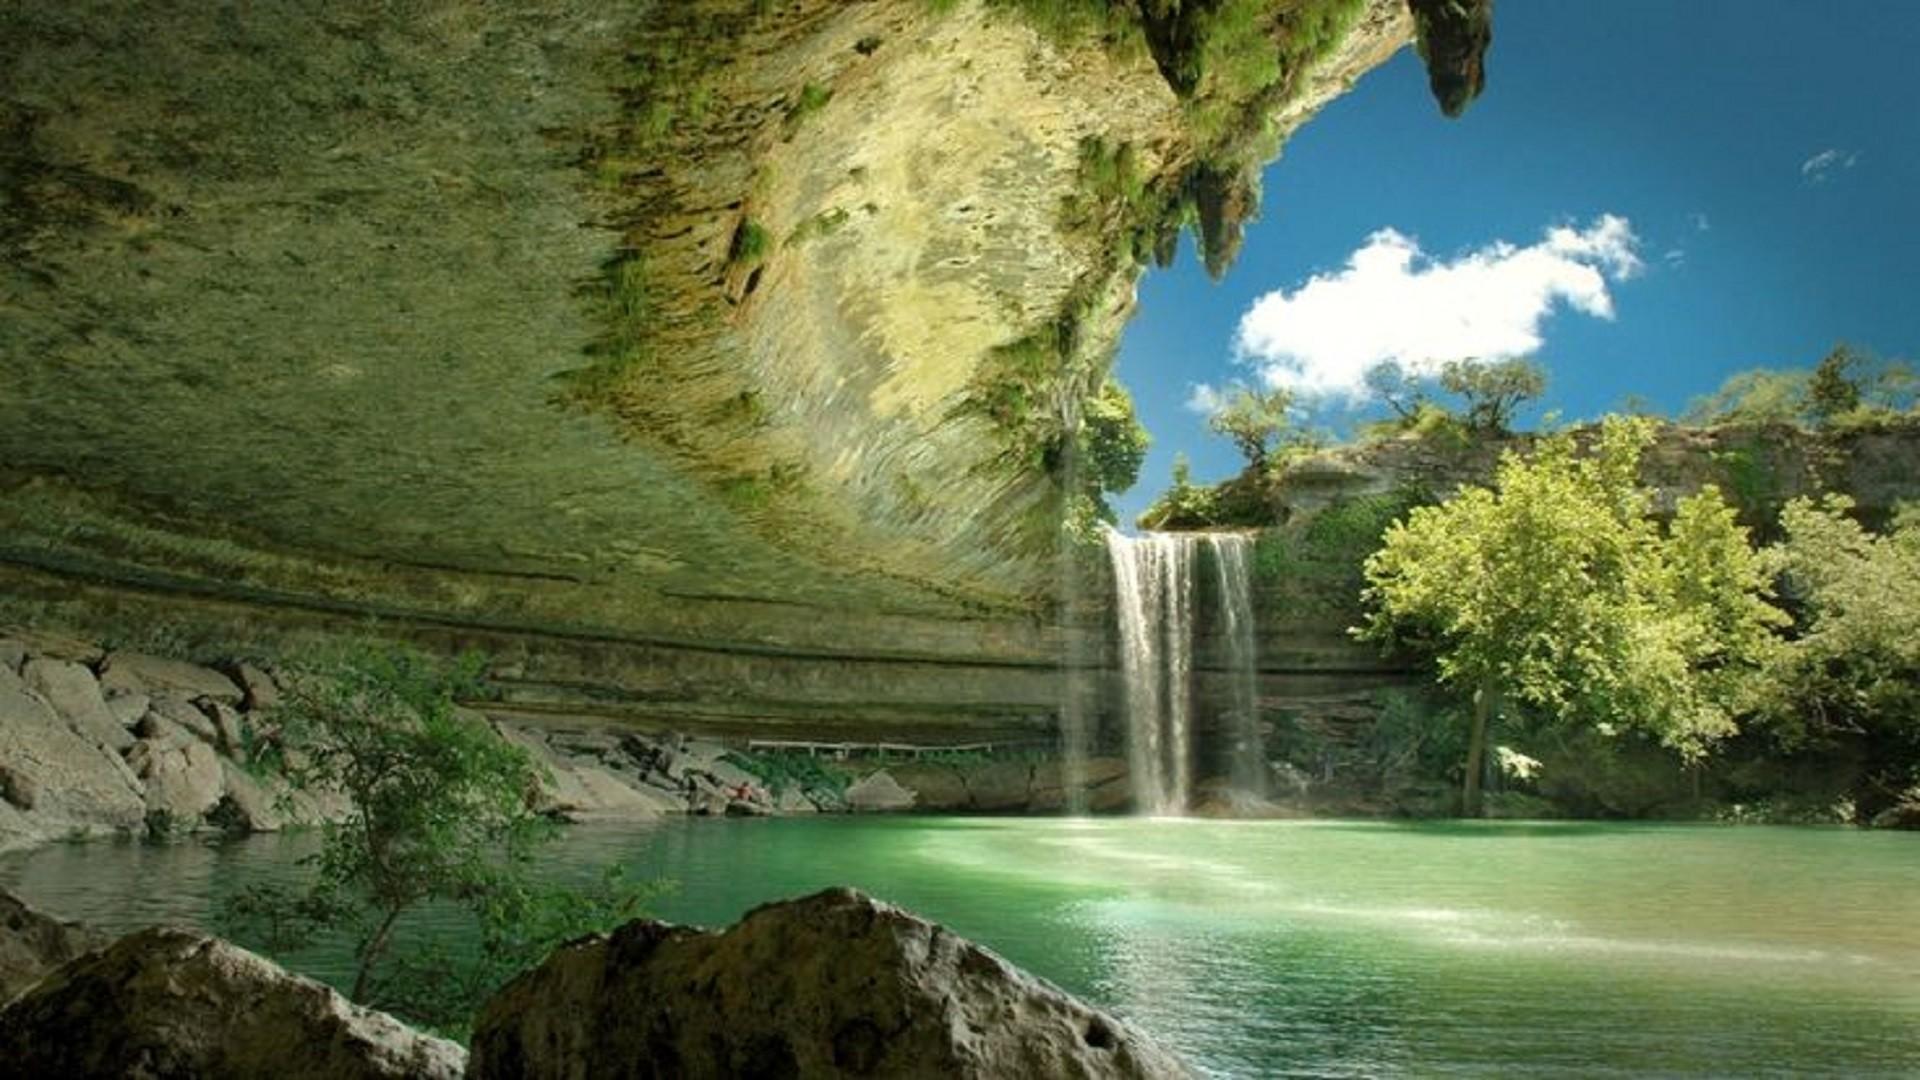 … nice-best-hd-wallpapers-for-desktop-waterfall …